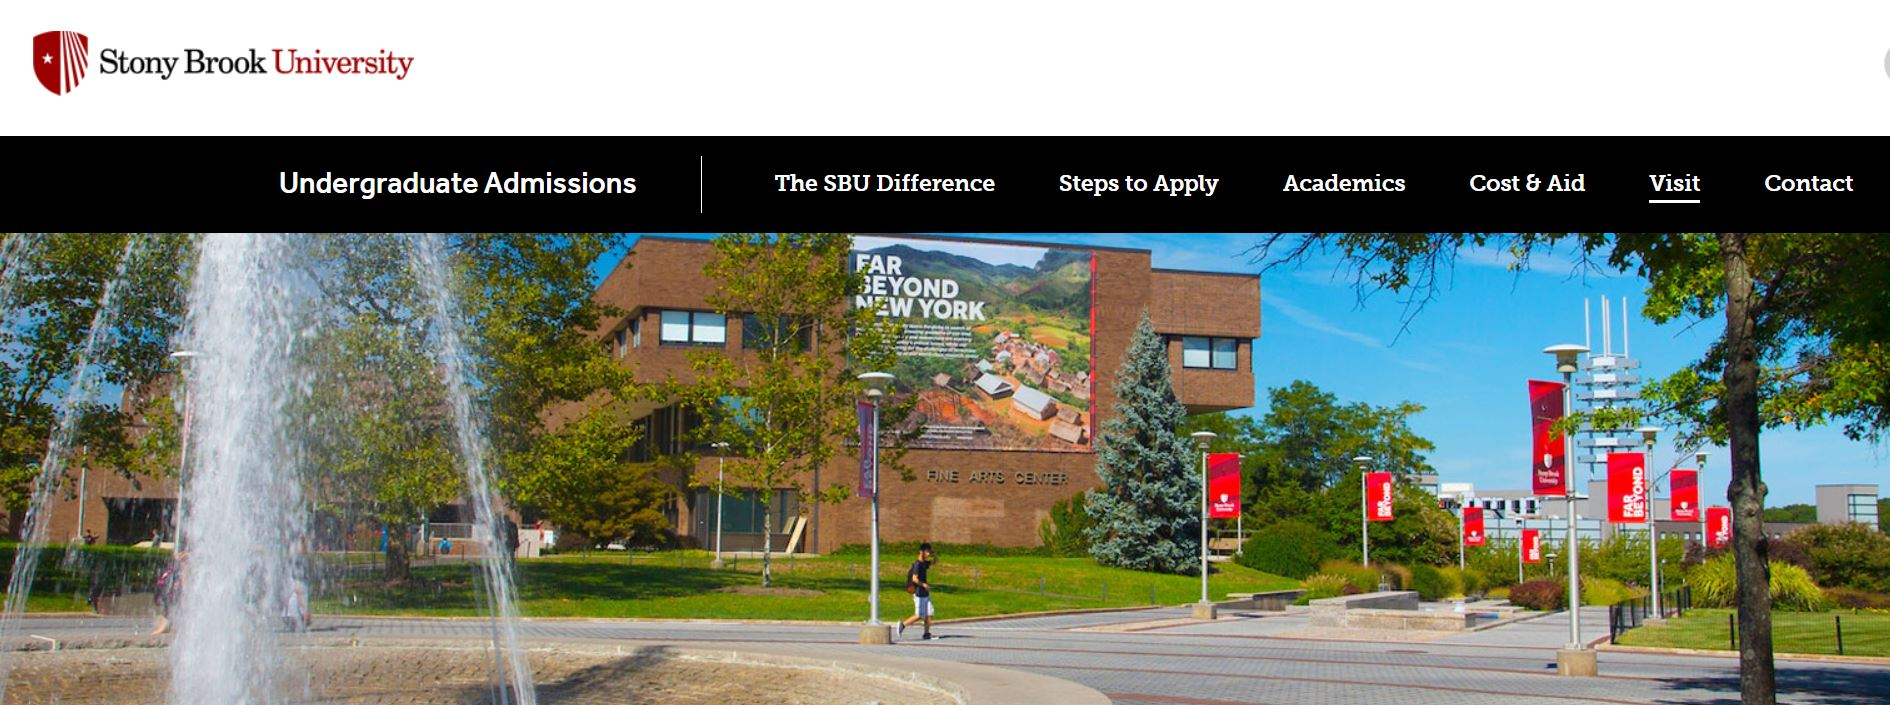 stony brook university home page